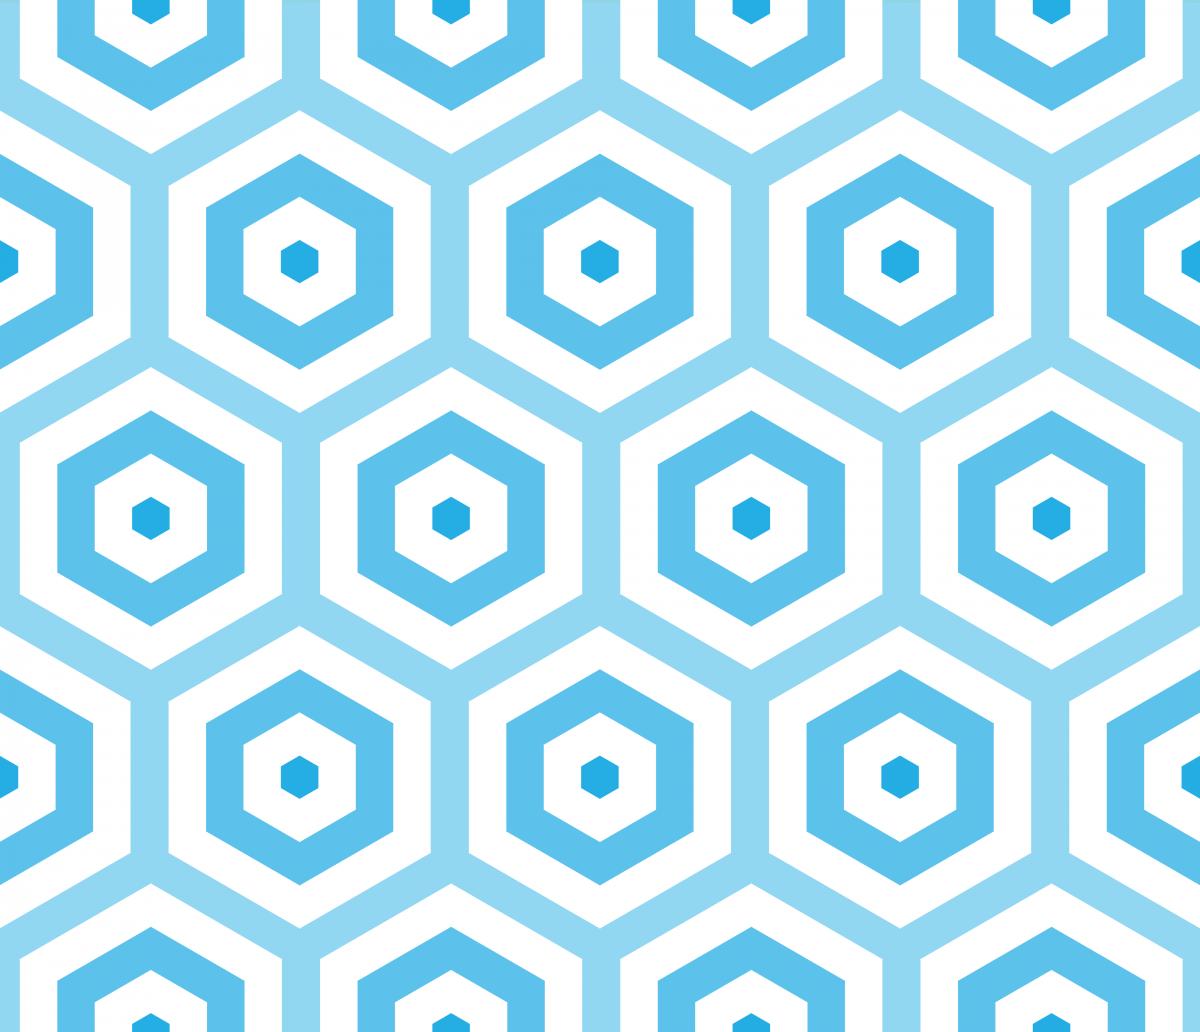 Geometric Pattern: Hexagon Hive: Light Positive / Red Wolf